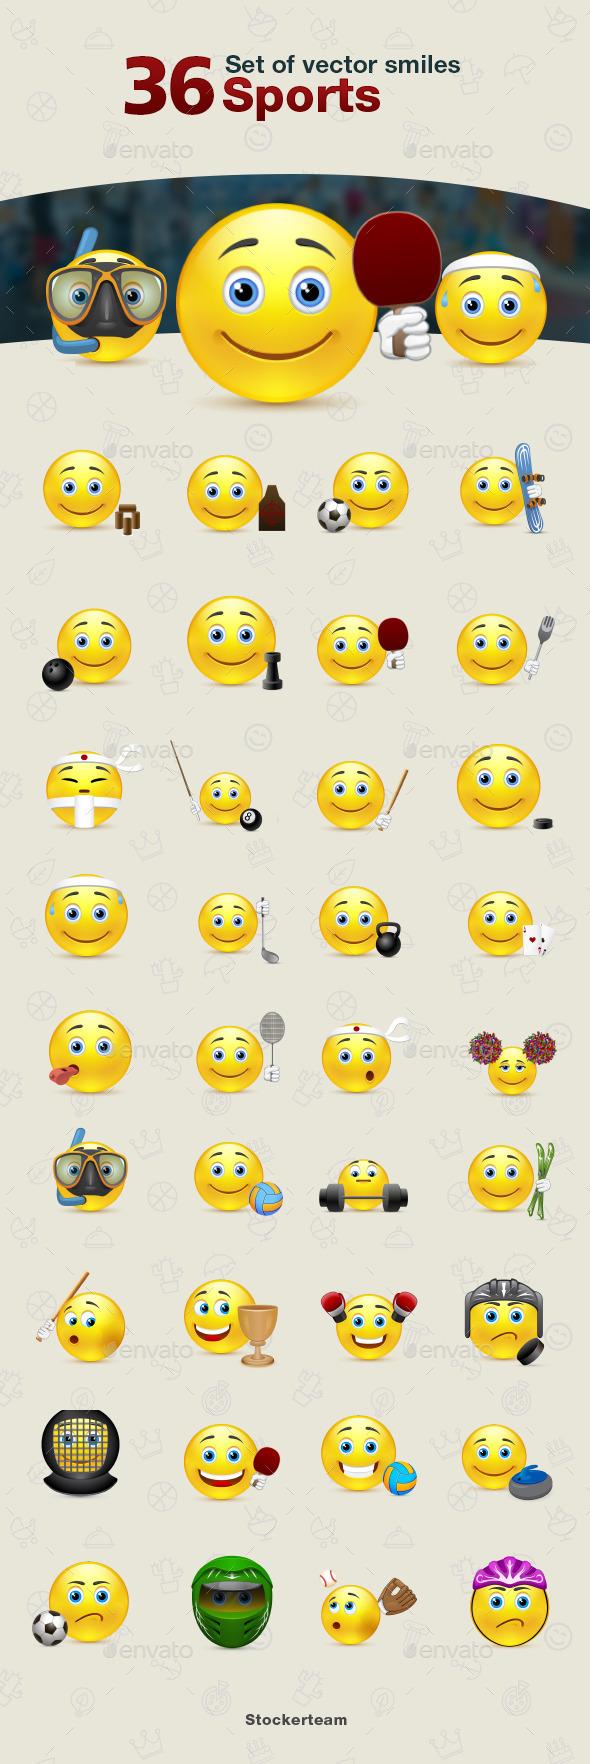 Smiles 36 Sports - Characters Vectors